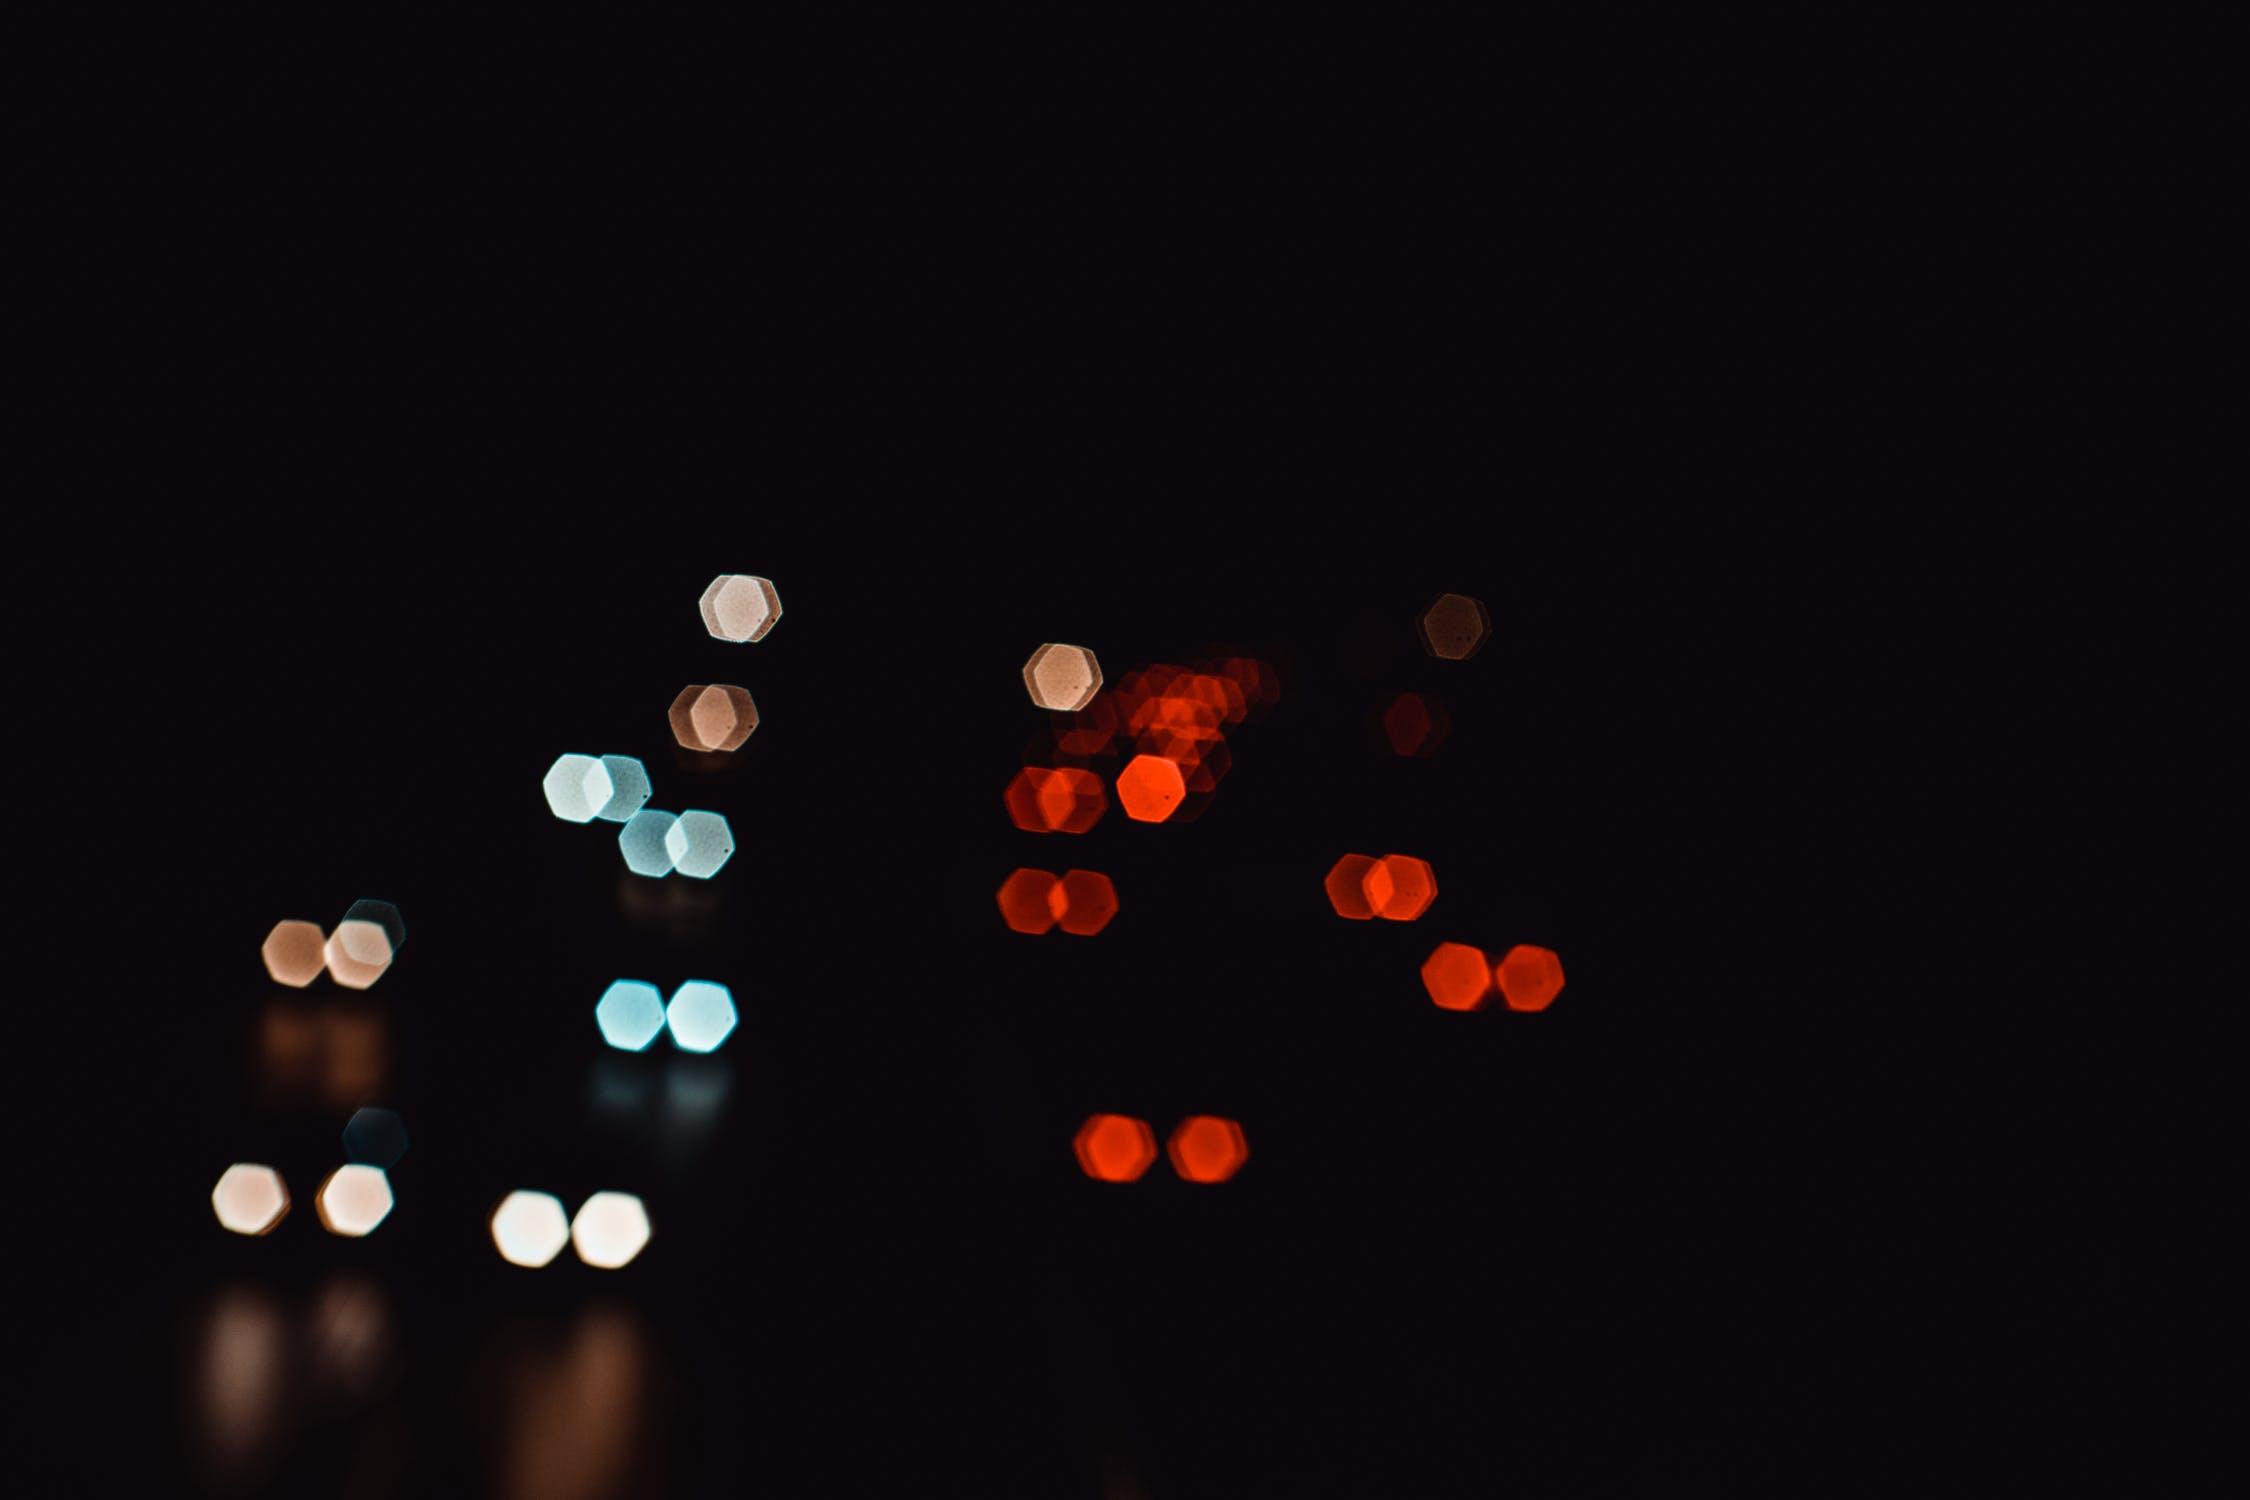 Suoni dal buio